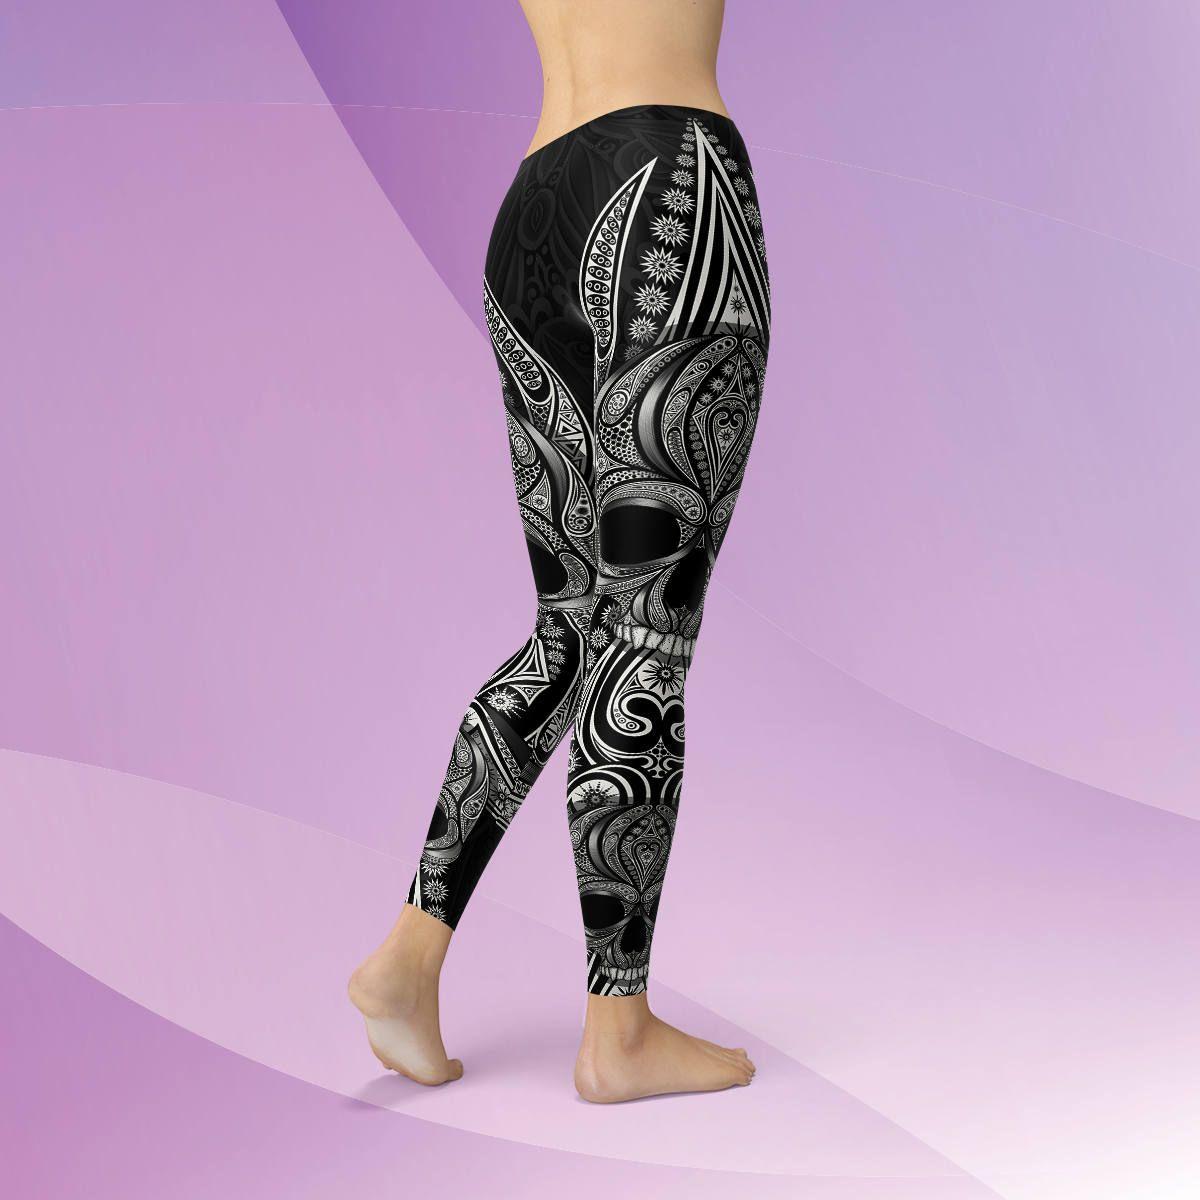 Yoga Leggings Black Sports Pants Mermaid Printed Dance Lightweight Bottoms